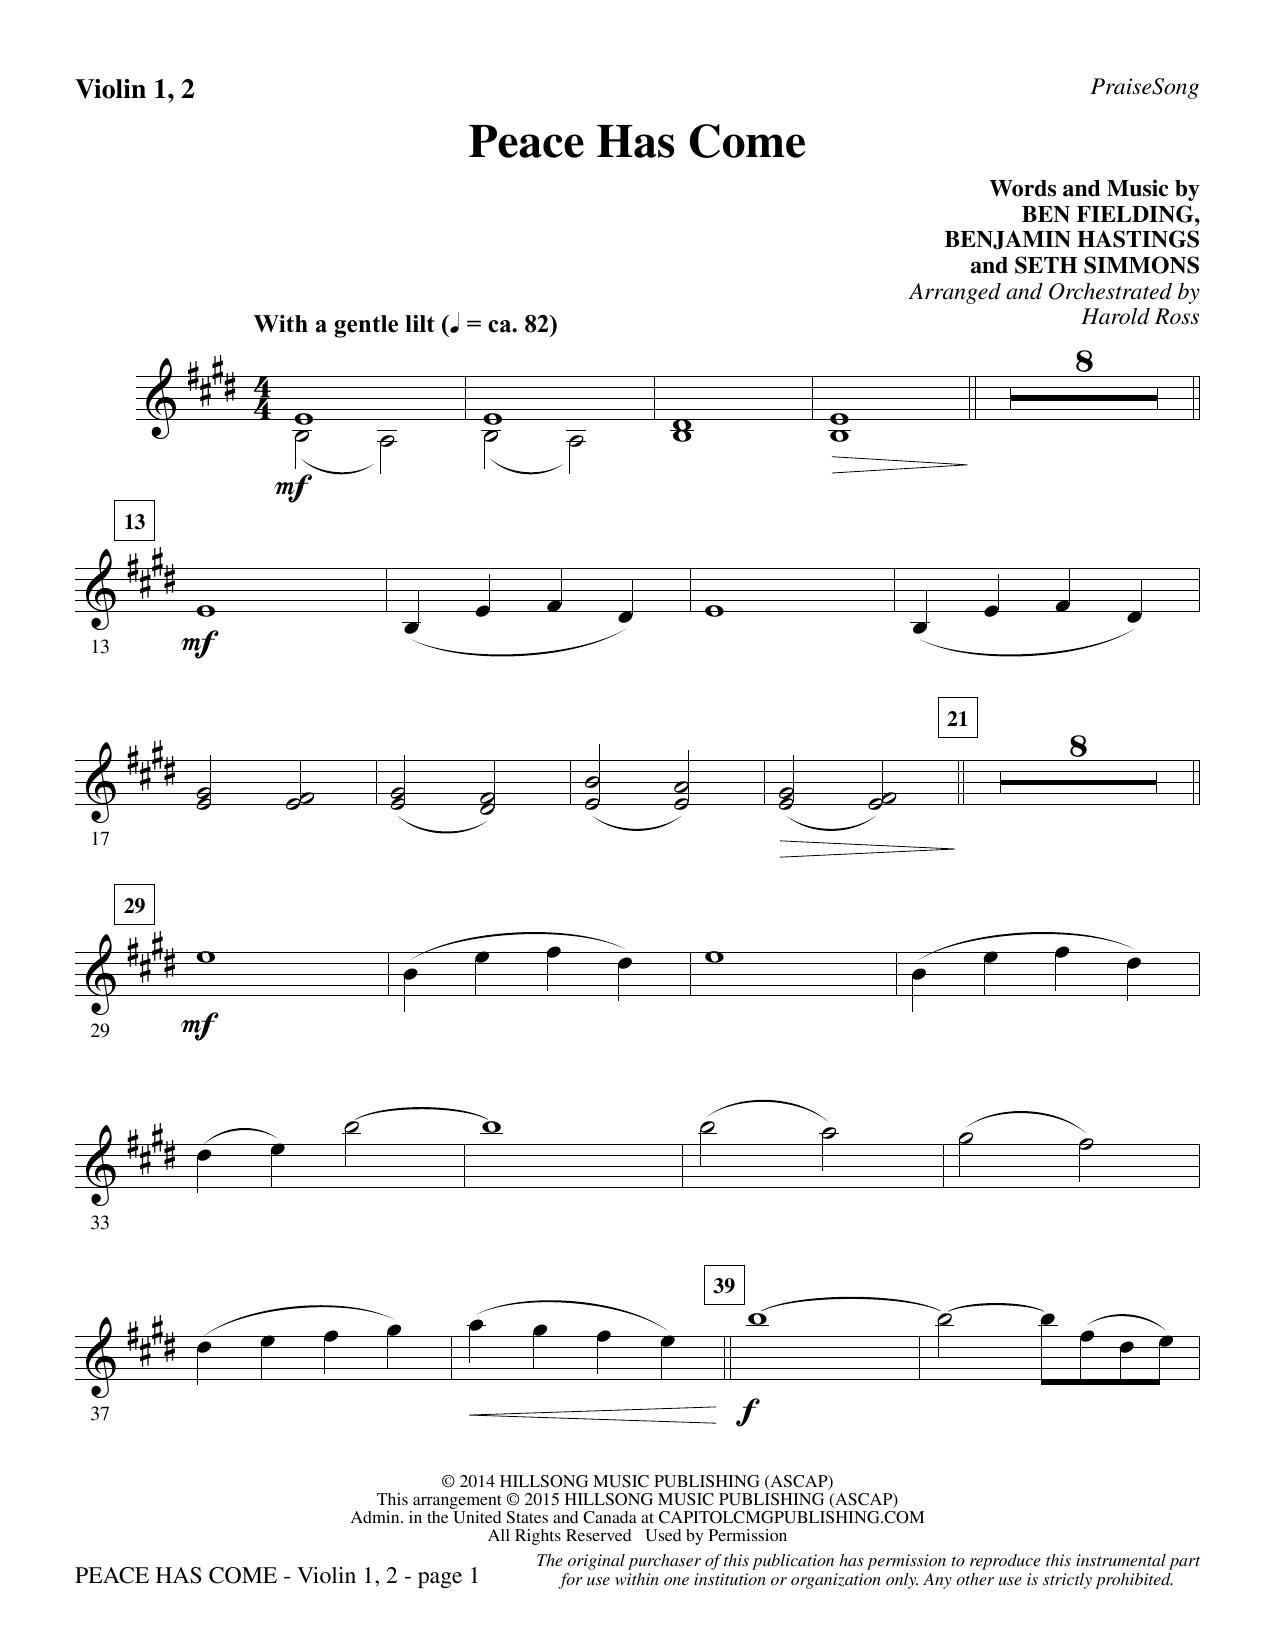 Peace Has Come - Violin 1, 2 sheet music